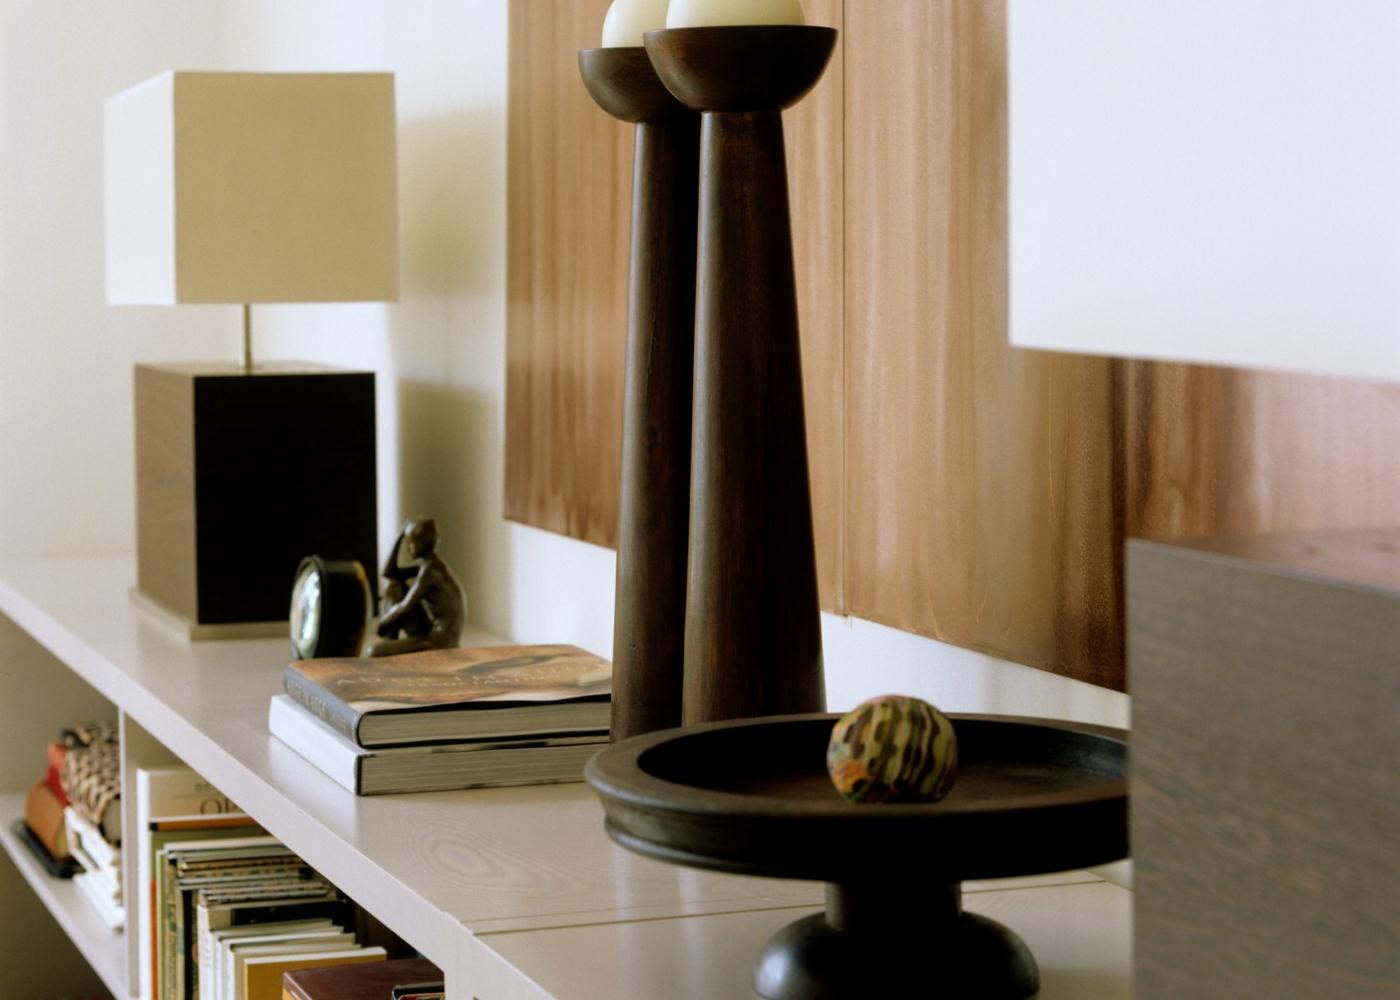 elementos decorativos zen